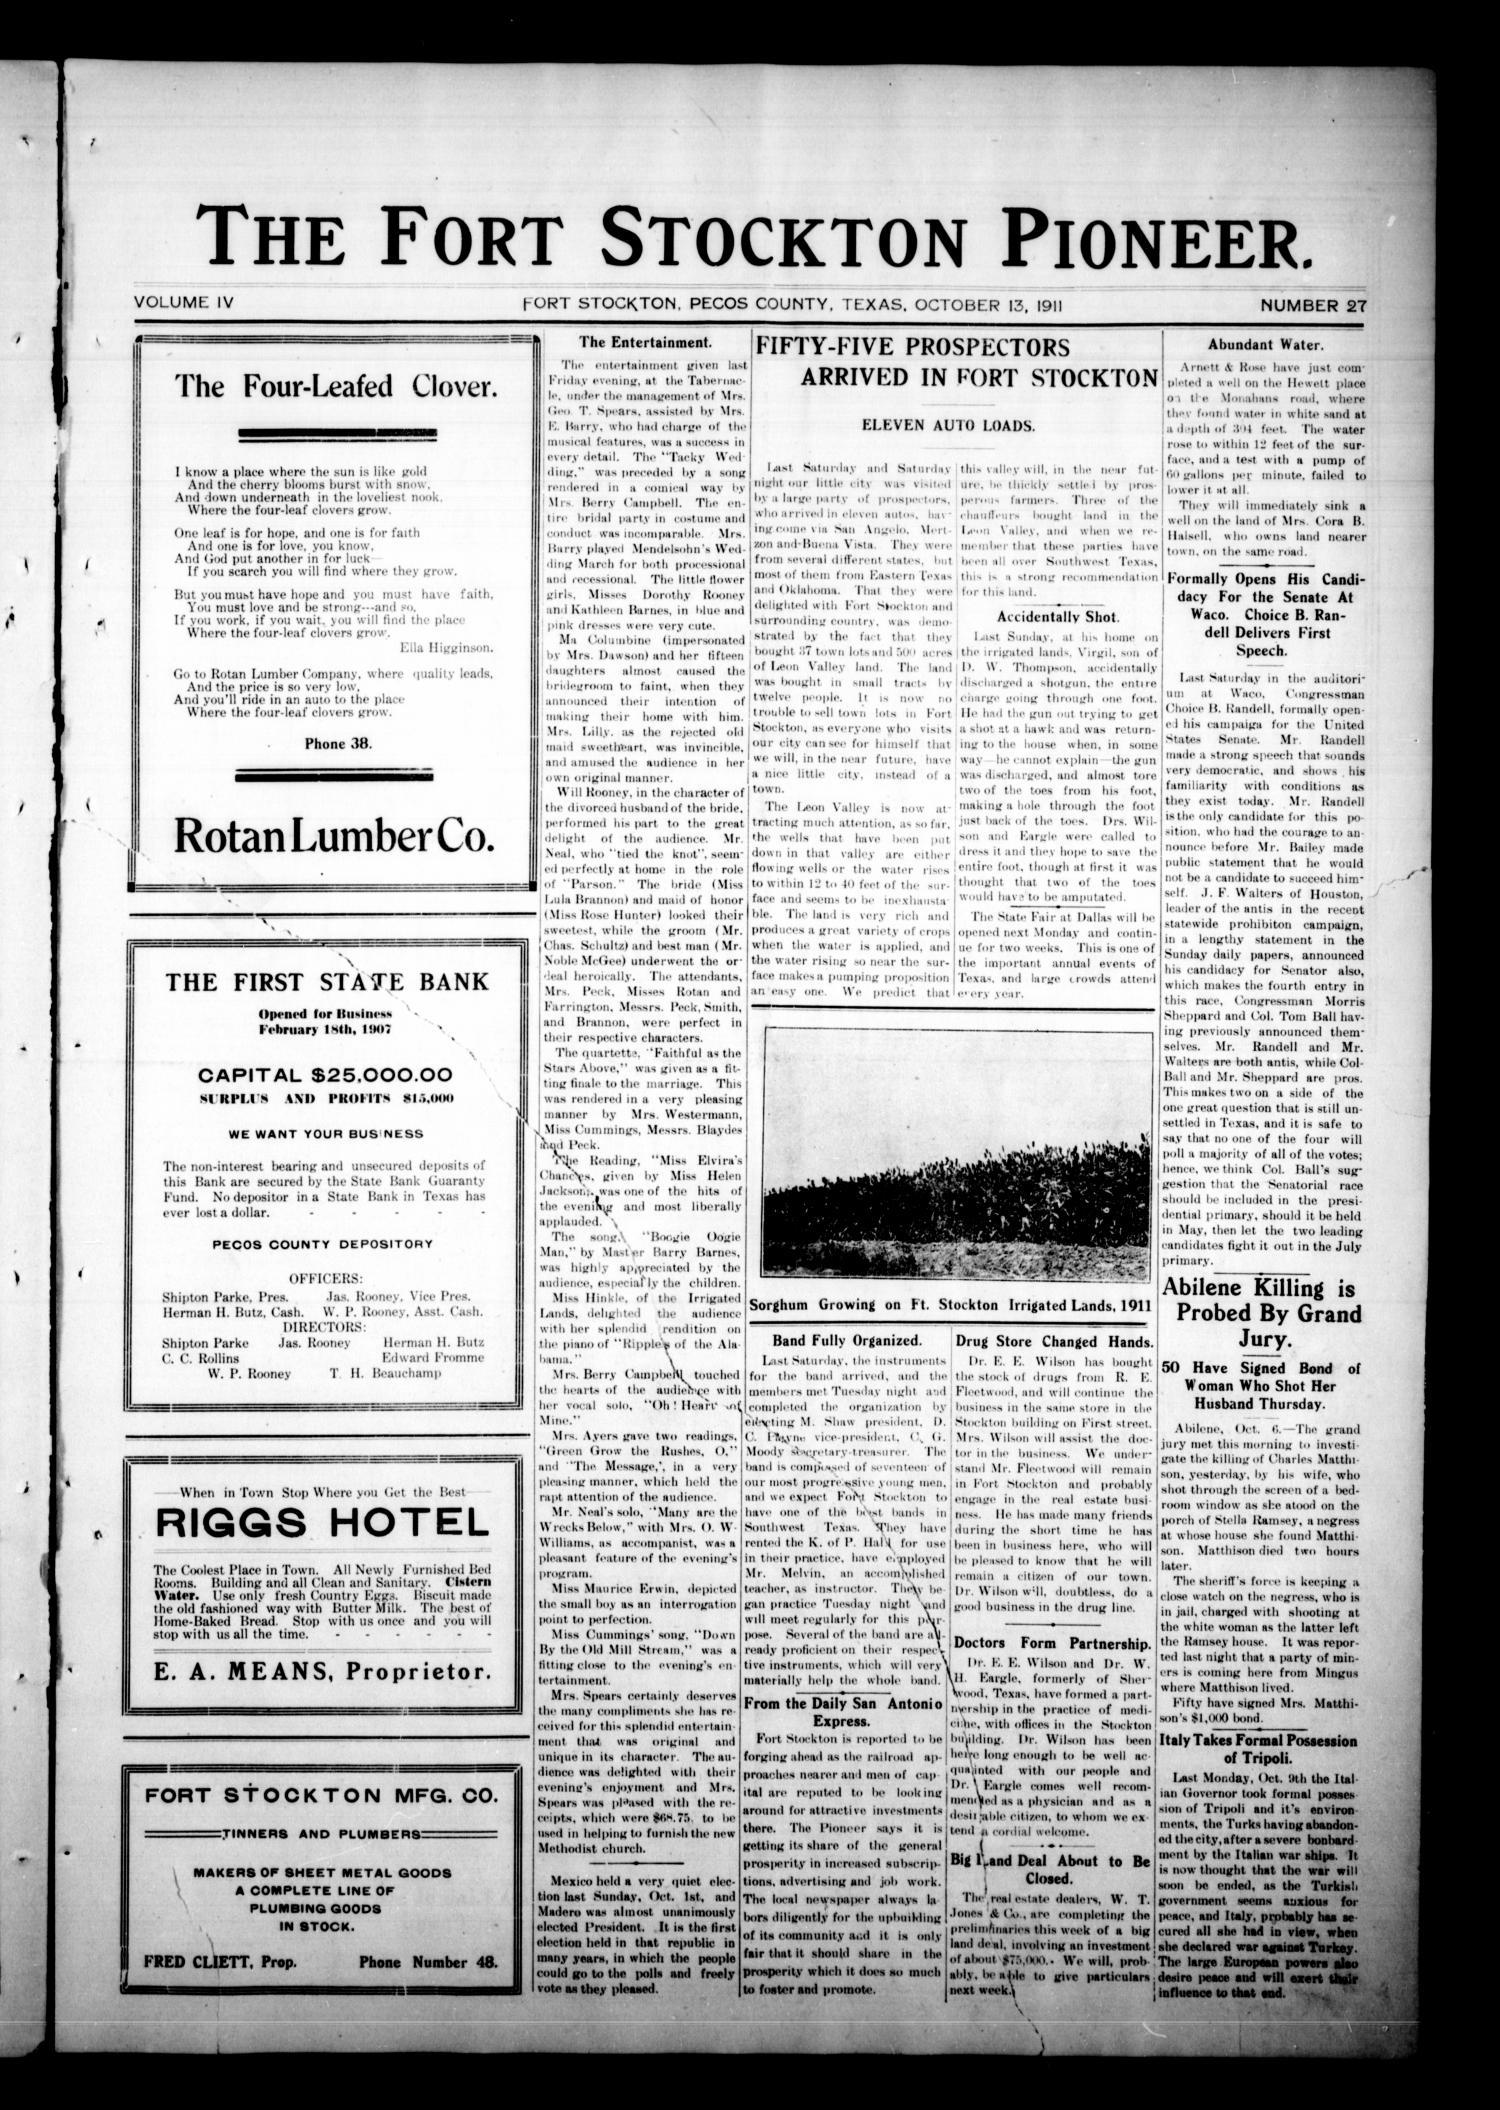 The Fort Stockton Pioneer Fort Stockton Tex Vol 4 No 27 Ed